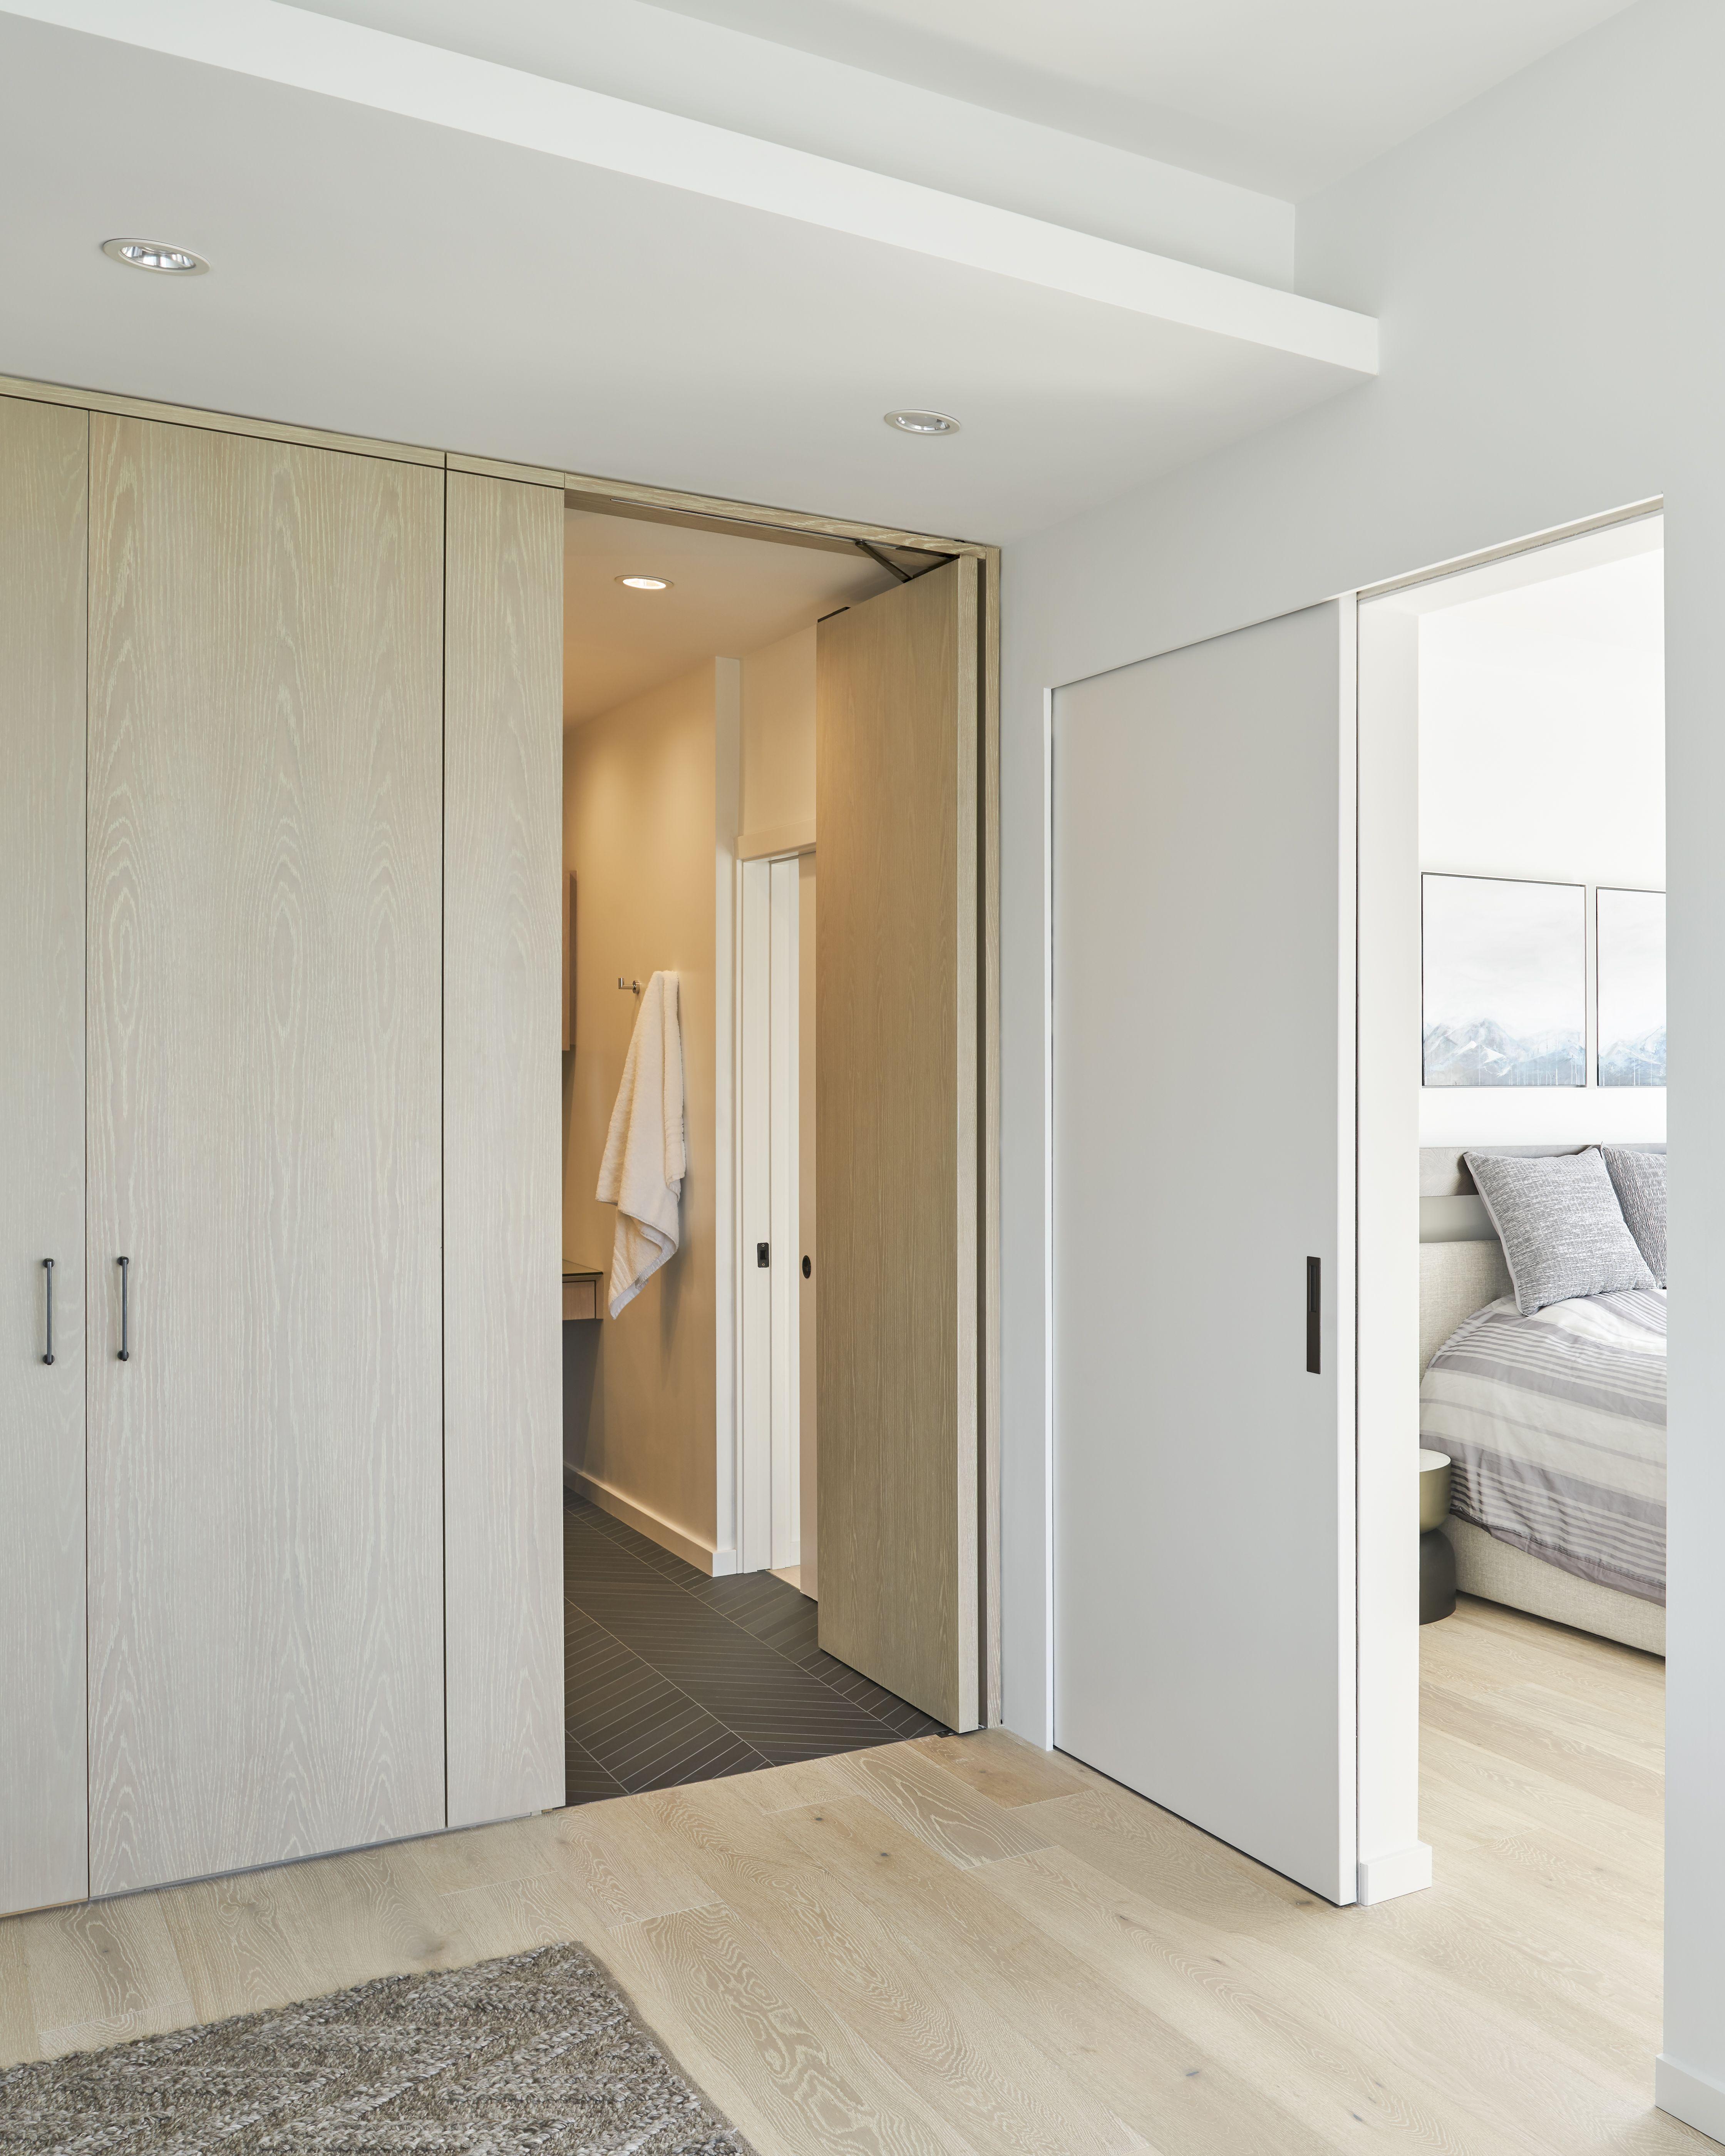 Bedroom / Bathroom Studios architecture, Home, Apartment